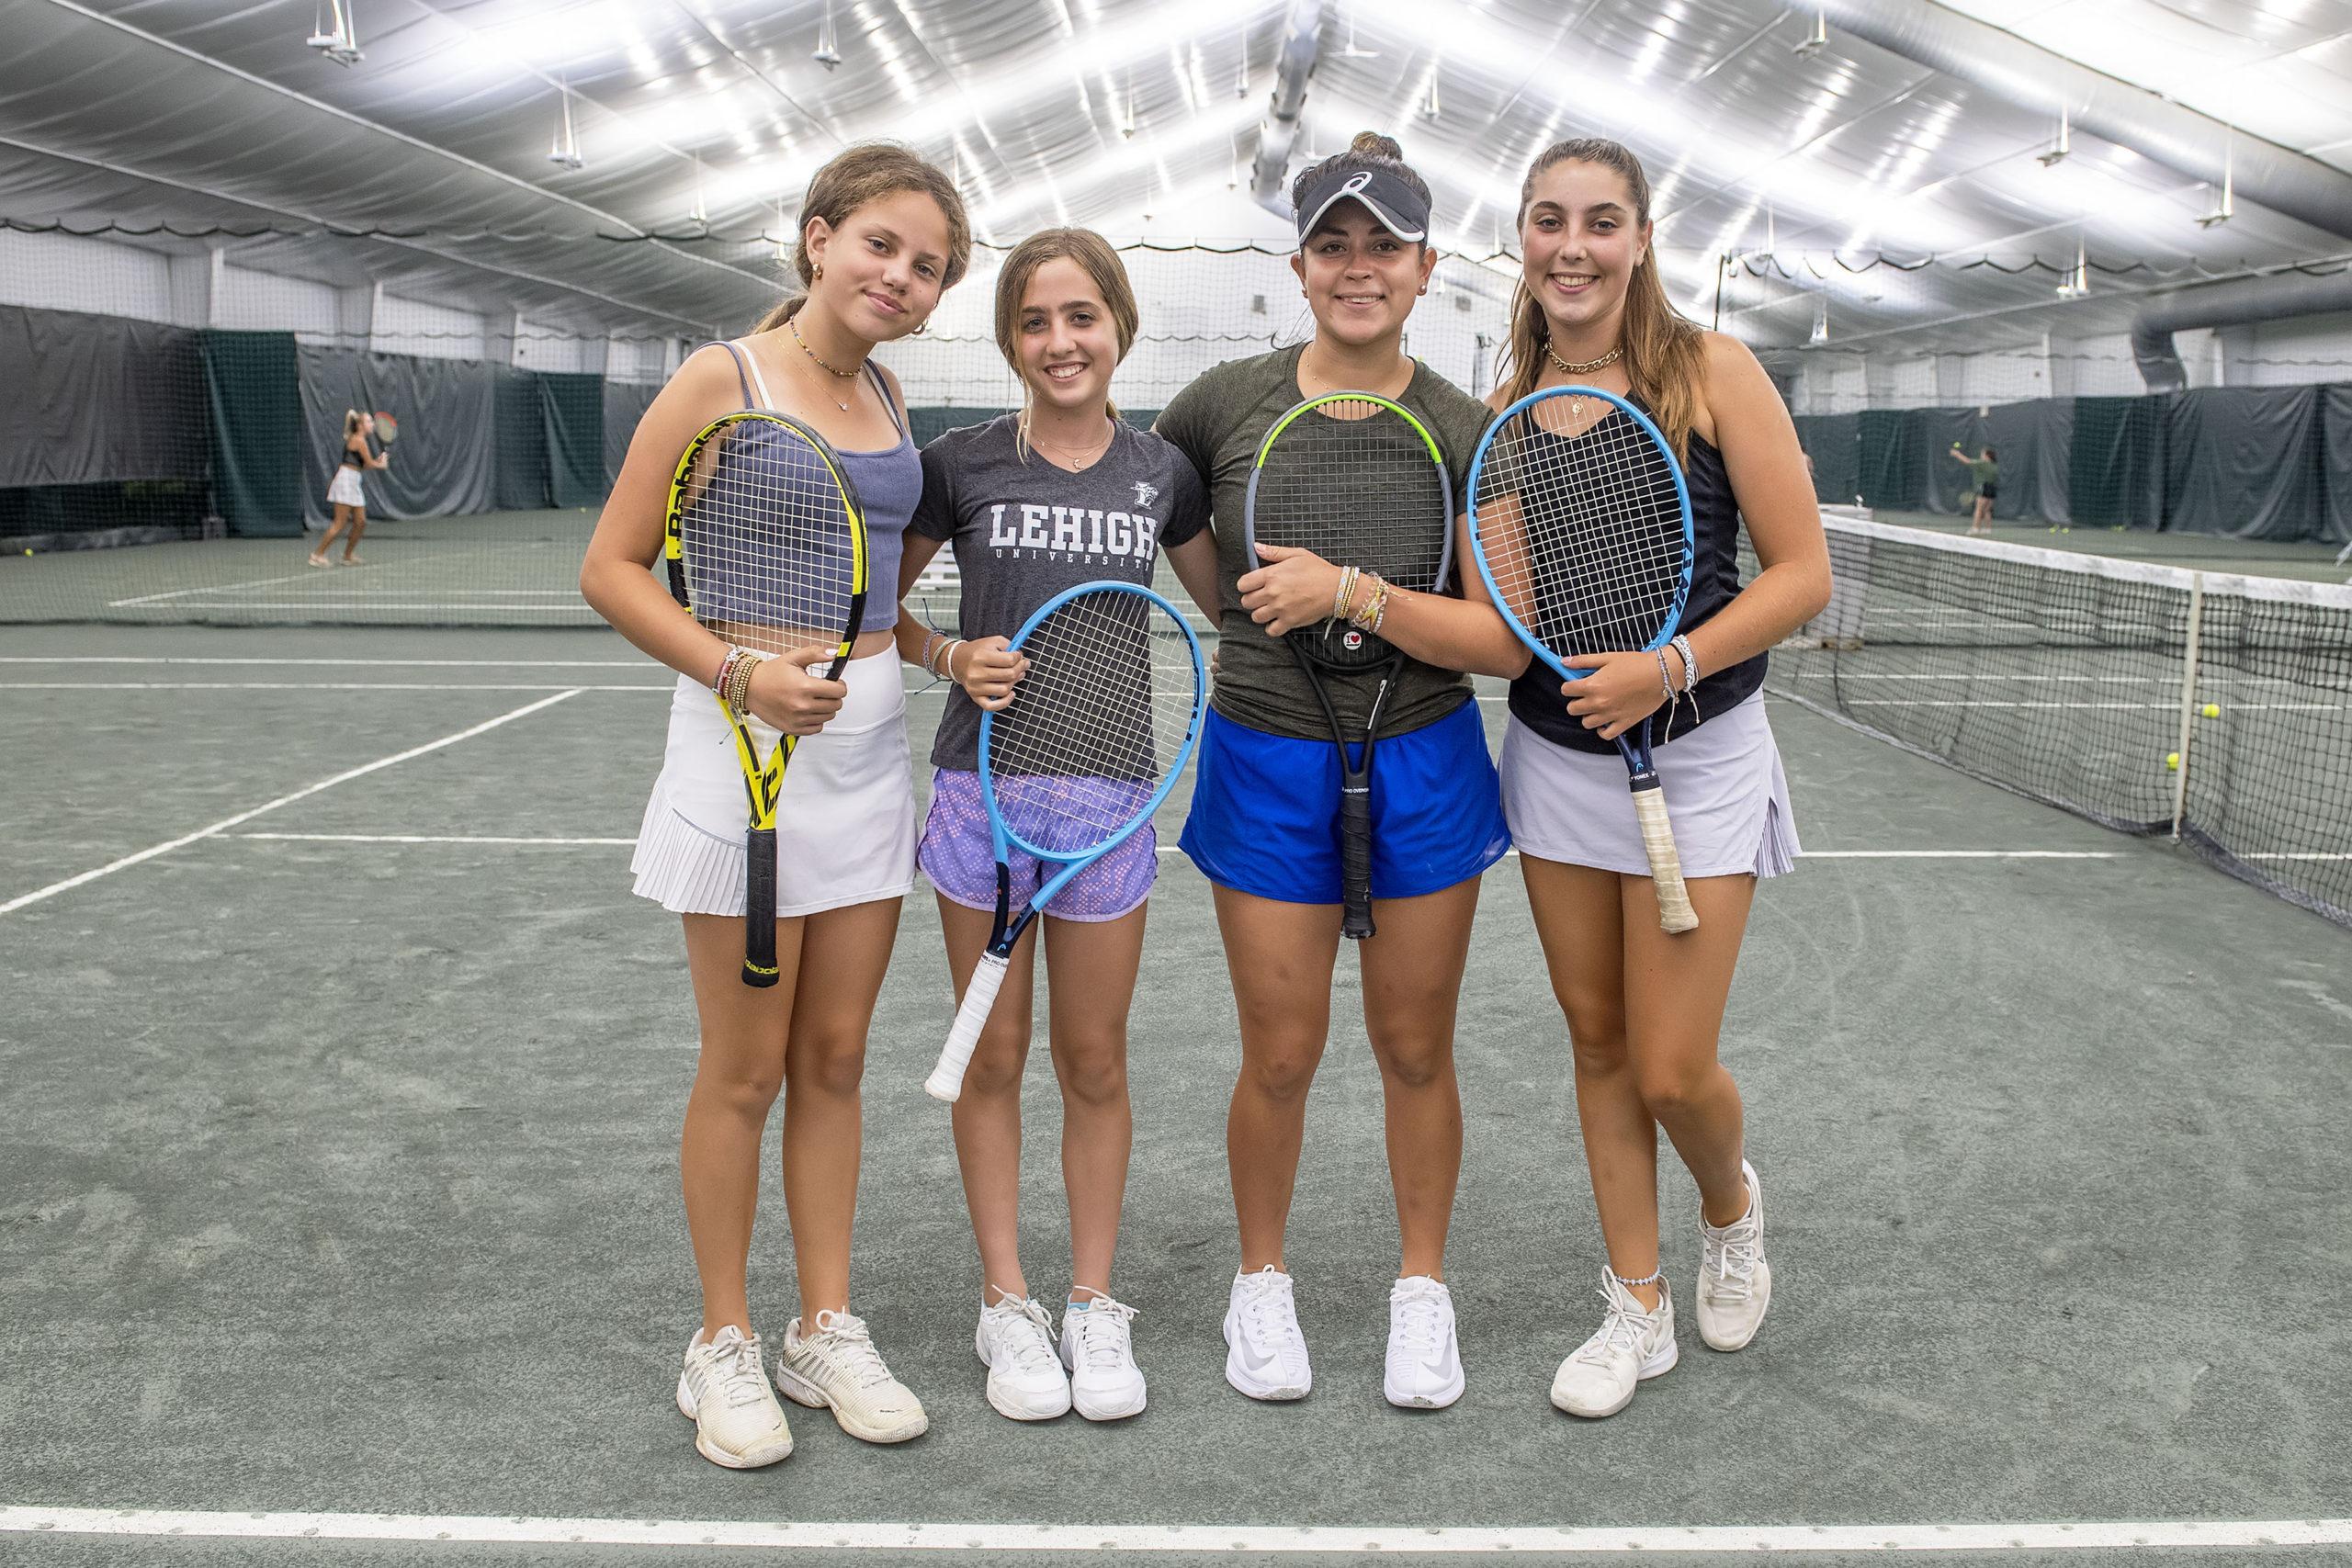 Pierson freshman Maya Molin, left, and eighth-grader Audrey Monaco are rising talent that join the Bonackers team this season, led by East Hampton senior Bella Wash and Pierson senior Sandrine Becht. MICHAEL HELLER